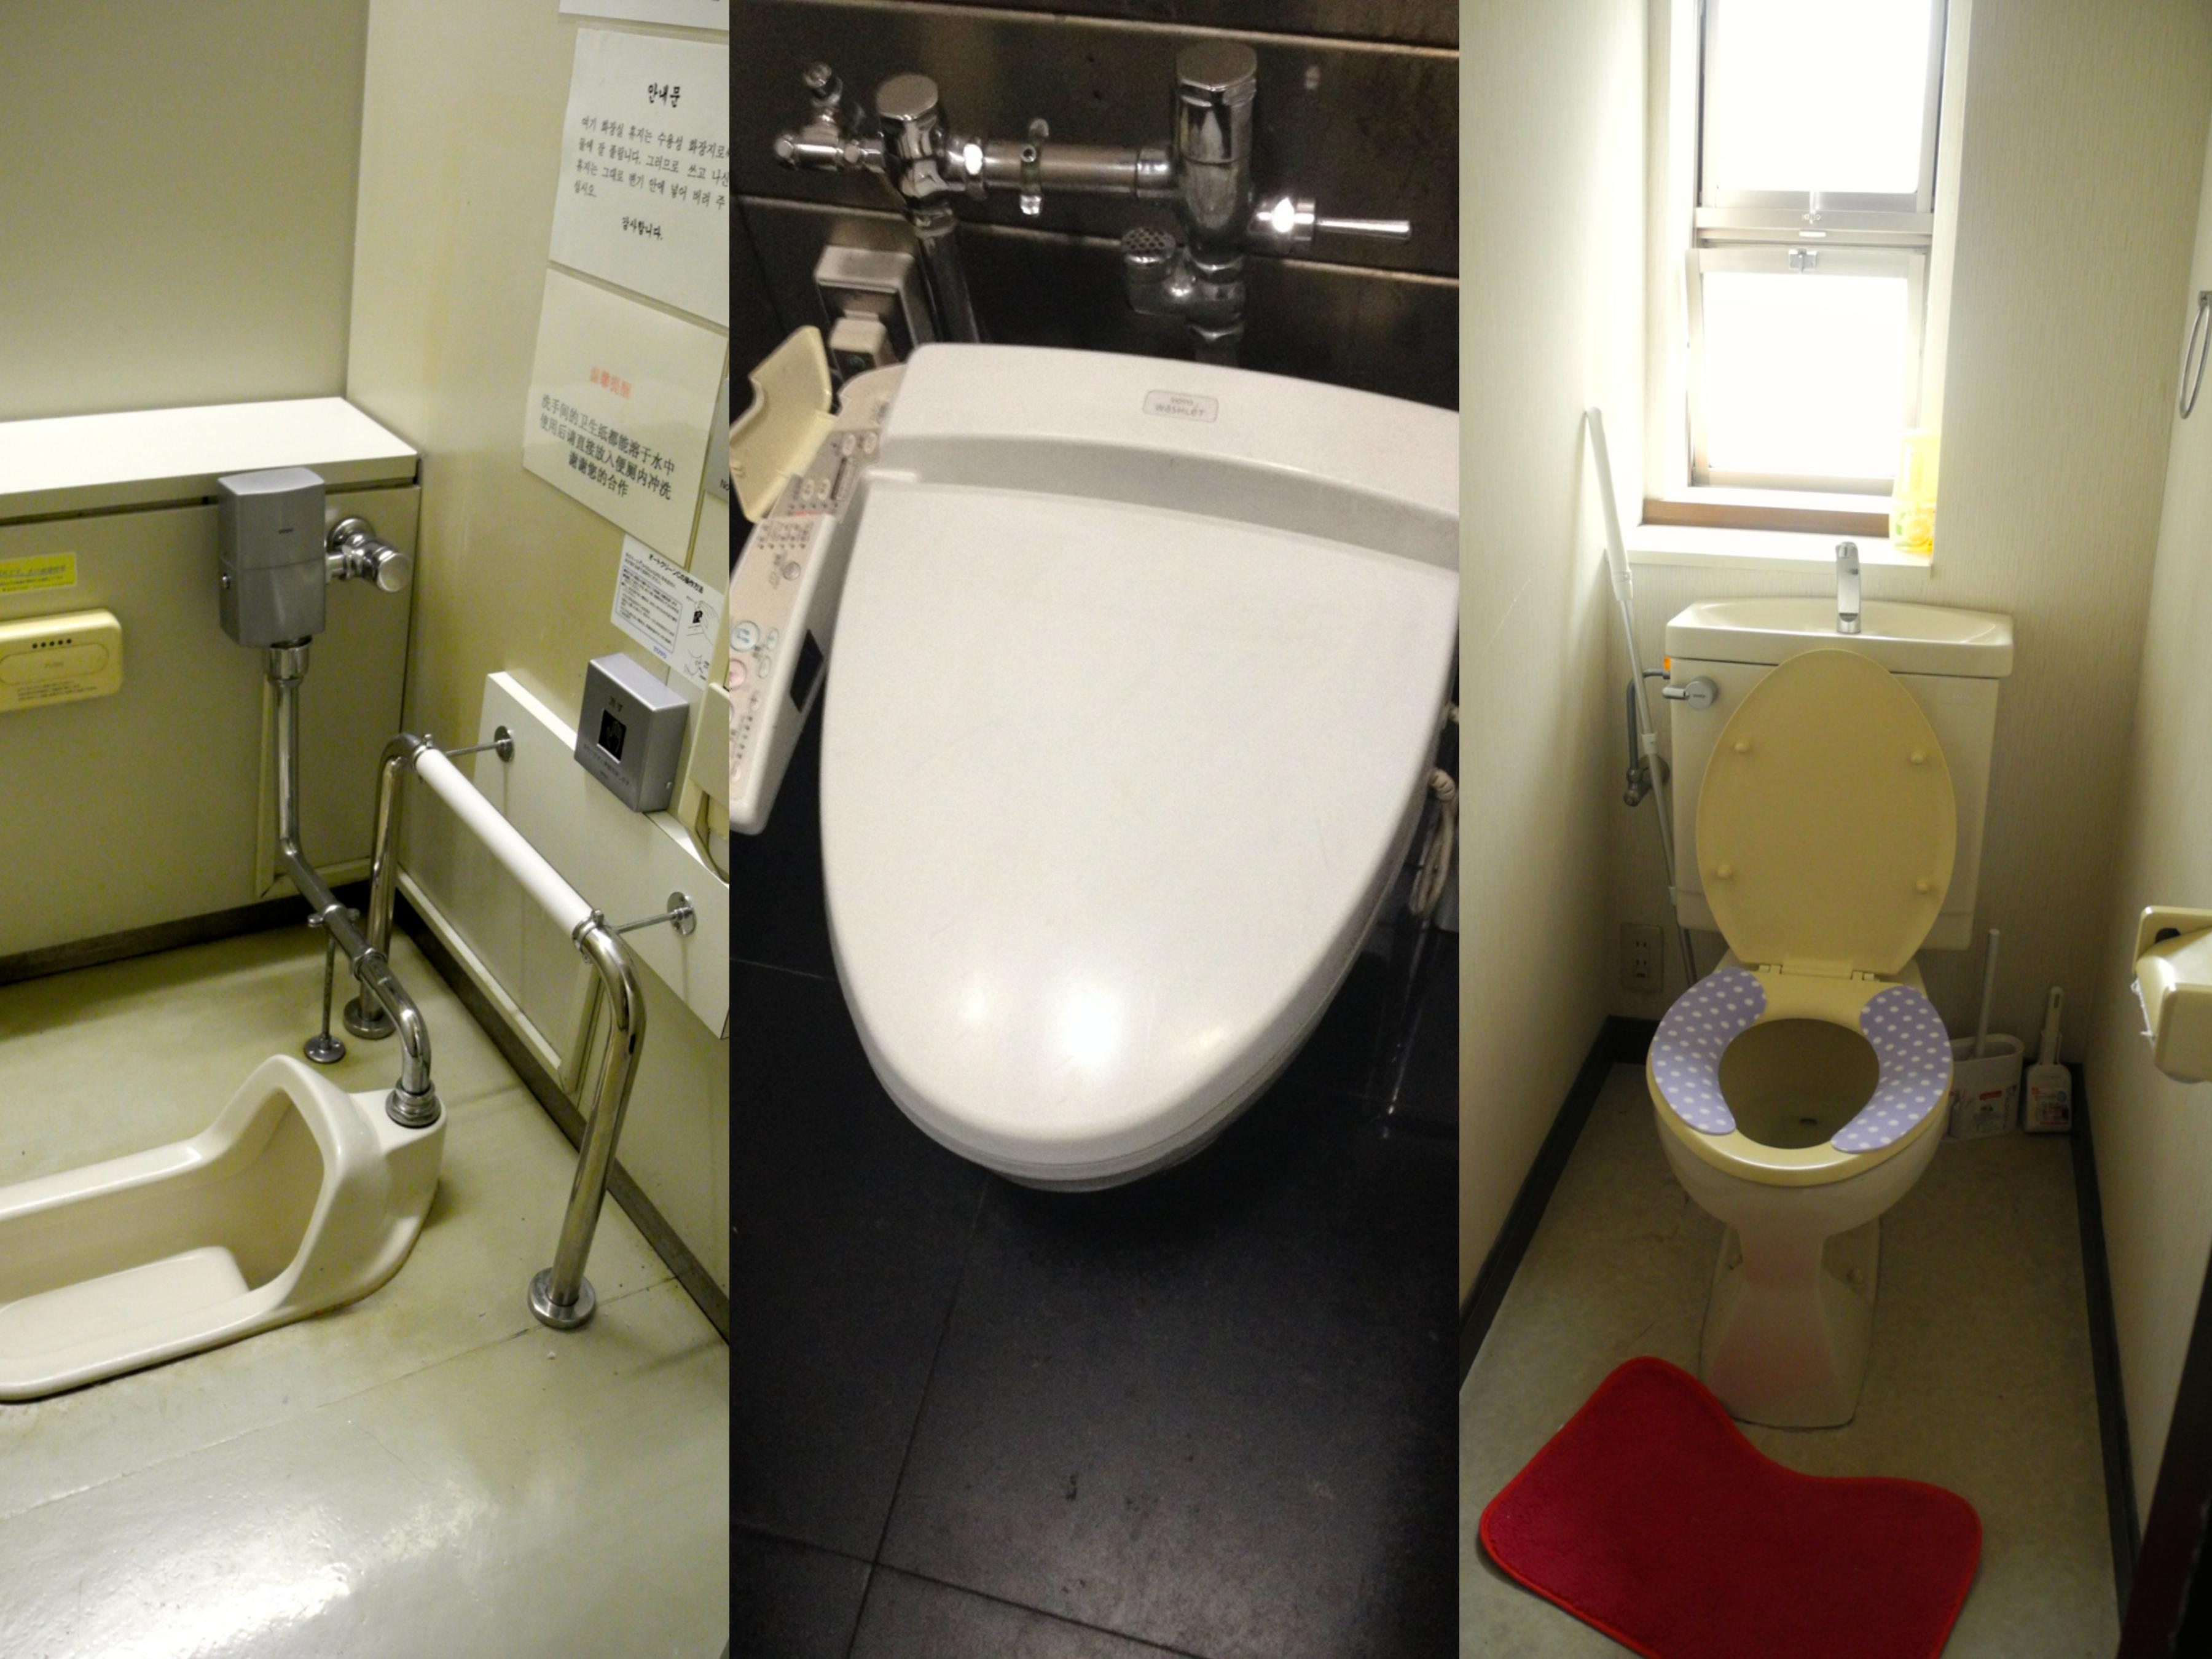 To-i-re wa, doku ni ari masu-ka? (Where is the toilet?) | Tales From ...